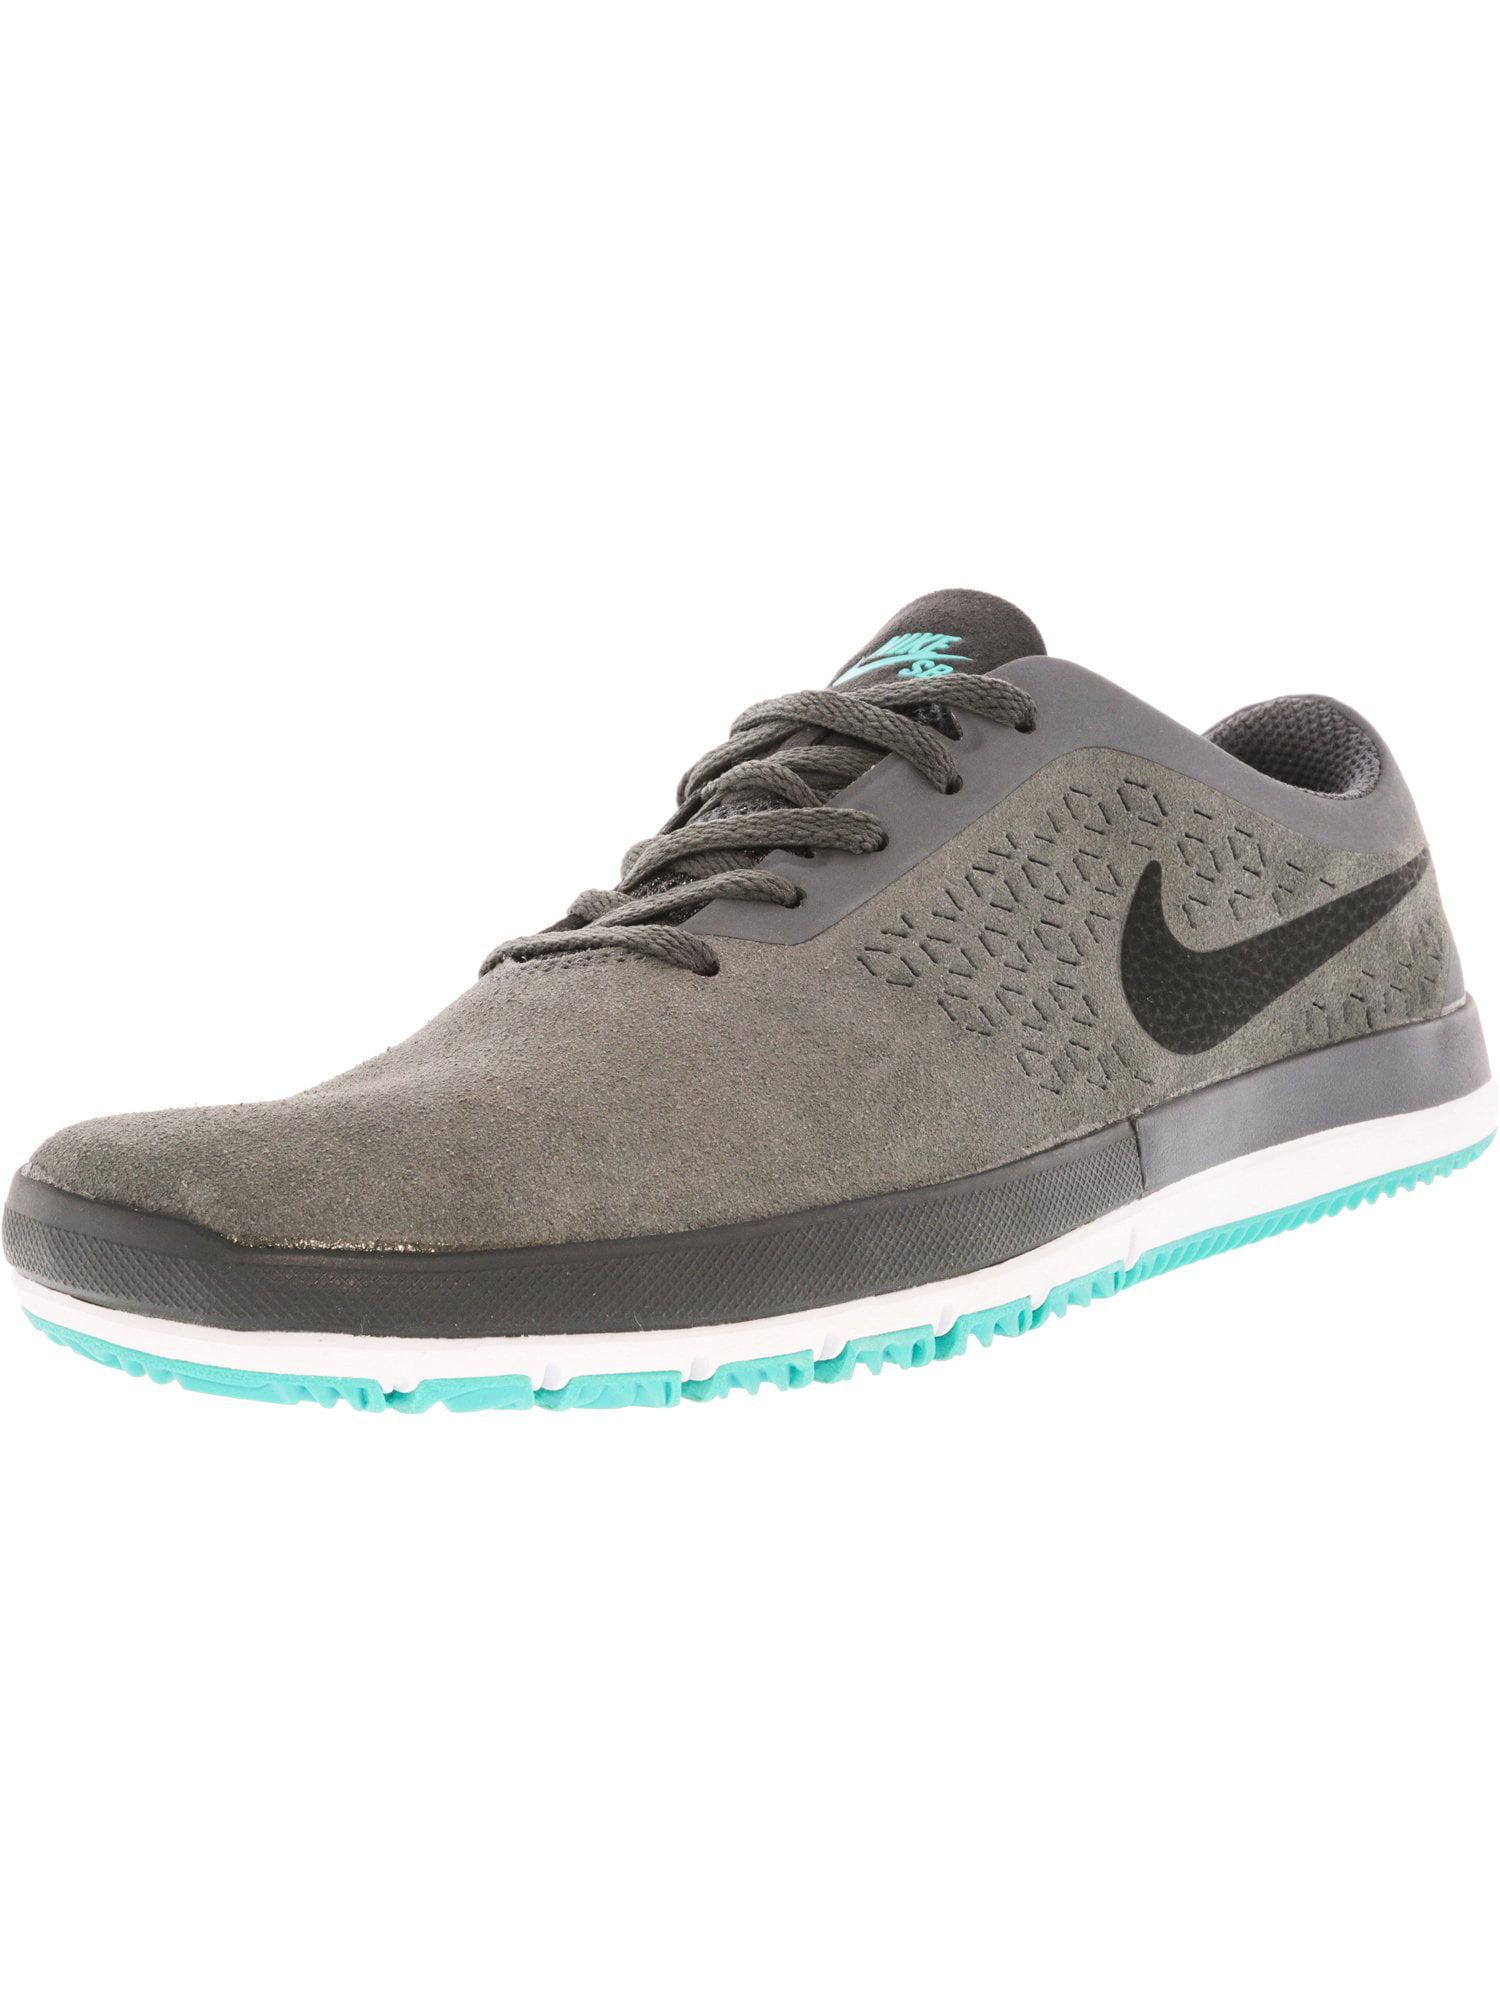 Nike Men's Free Sb Nano Dark Grey / Black Ankle-High Skateboarding Shoe - 9M